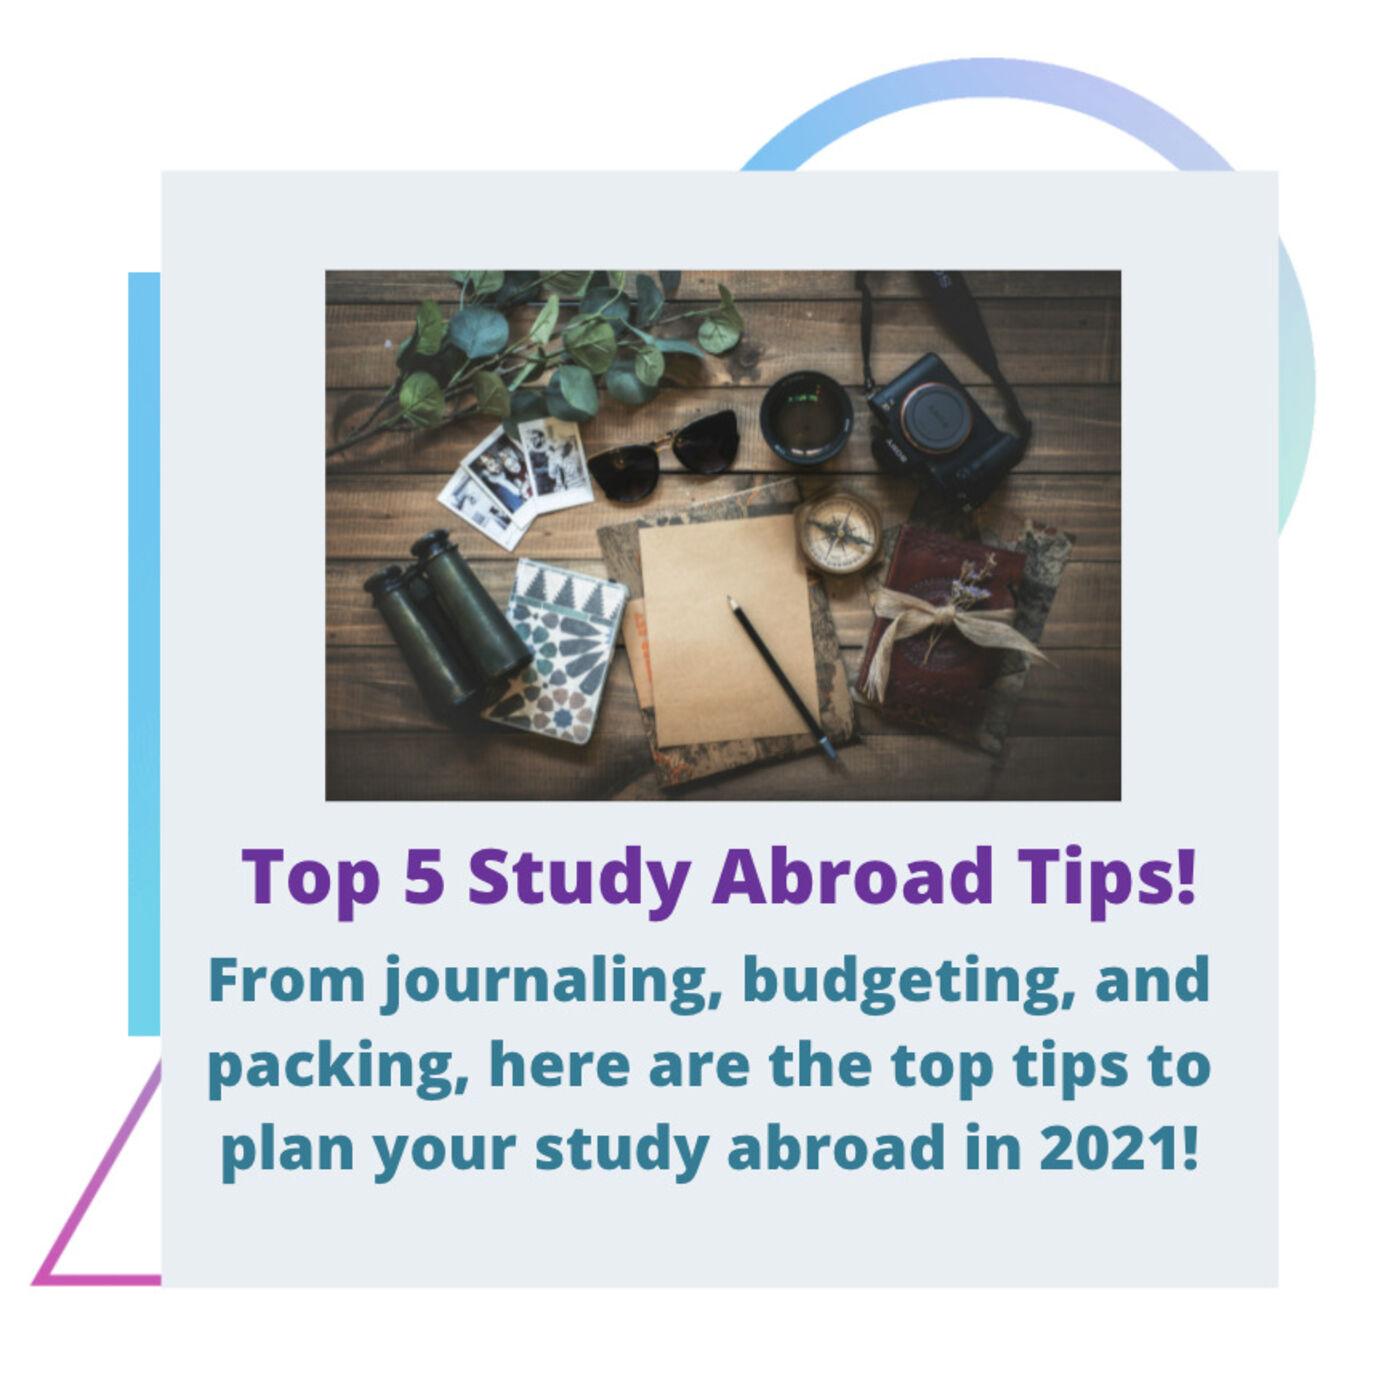 Season 3, Ep. 1 - 2021 Study Abroad Tips & Tricks